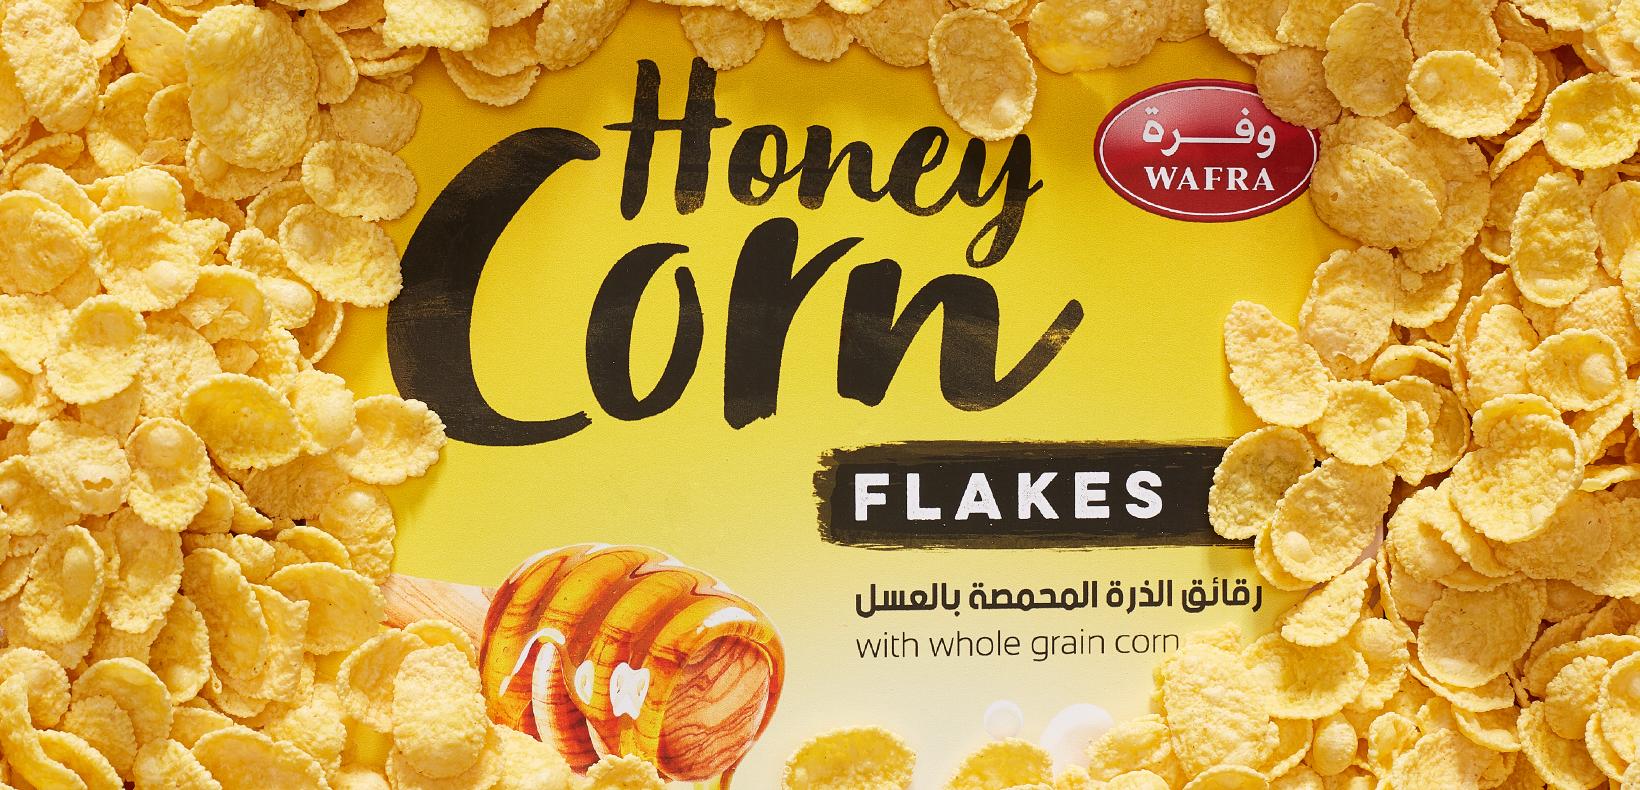 кукурузные хлопья логотип